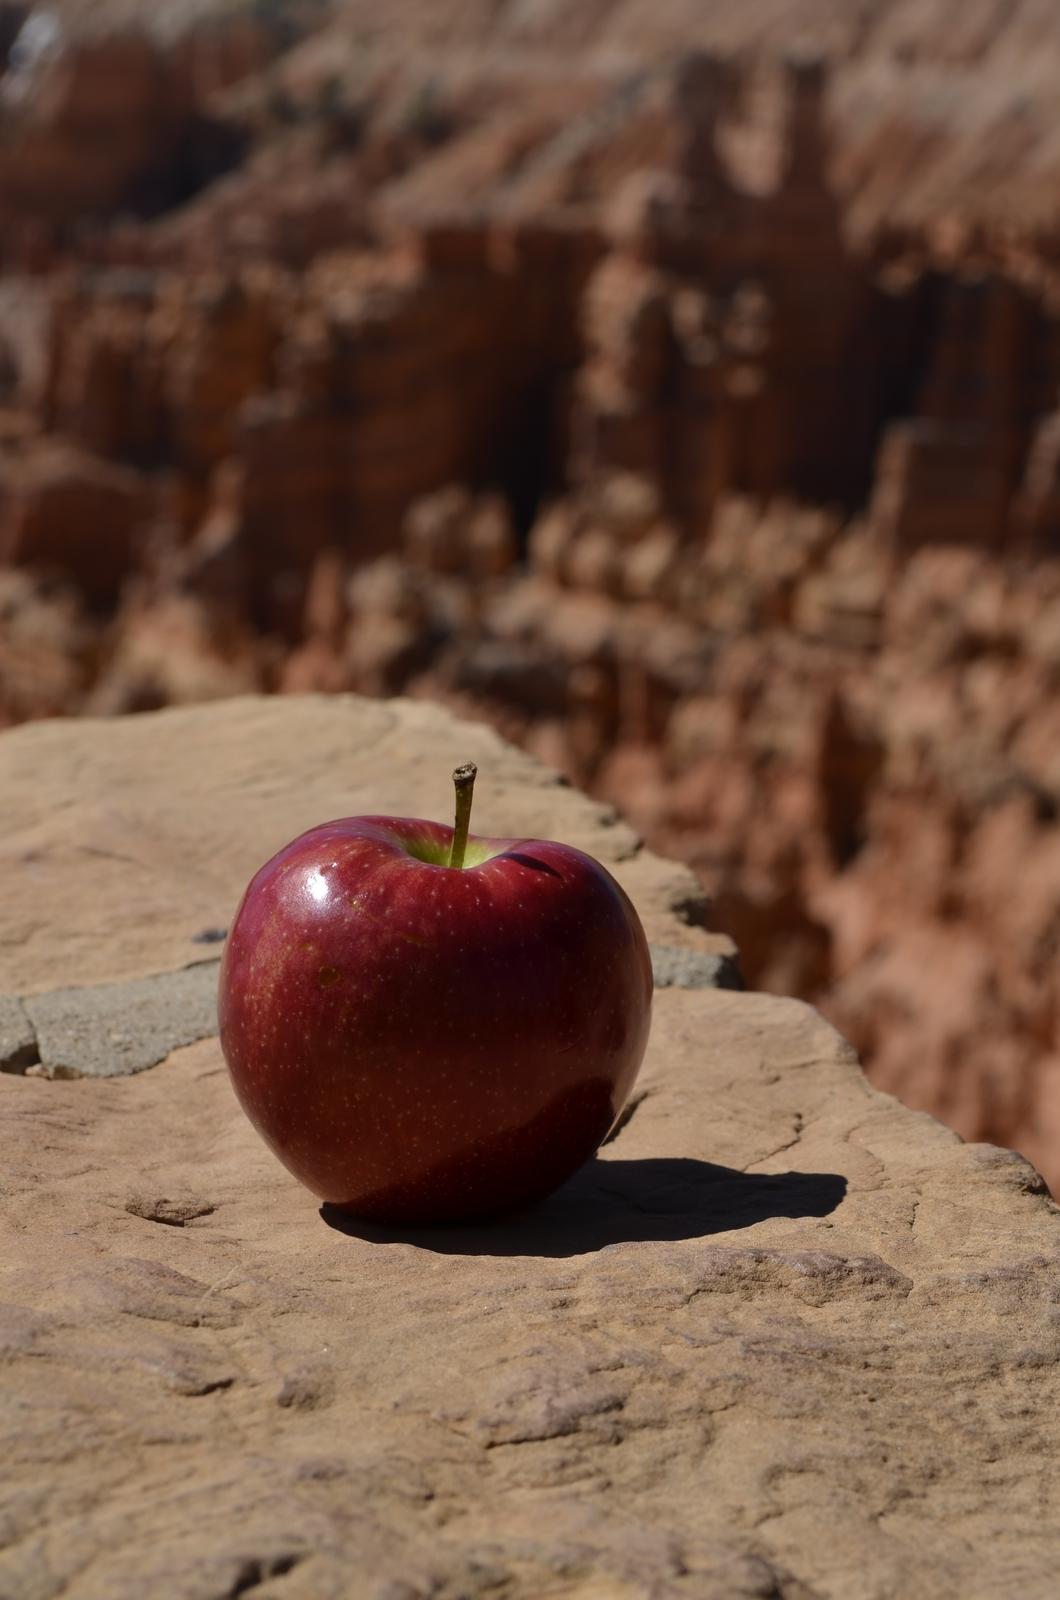 """If you can dream it, you can do it."" - Vitajte na inej planéte - v Bryce Canyone! :-)"